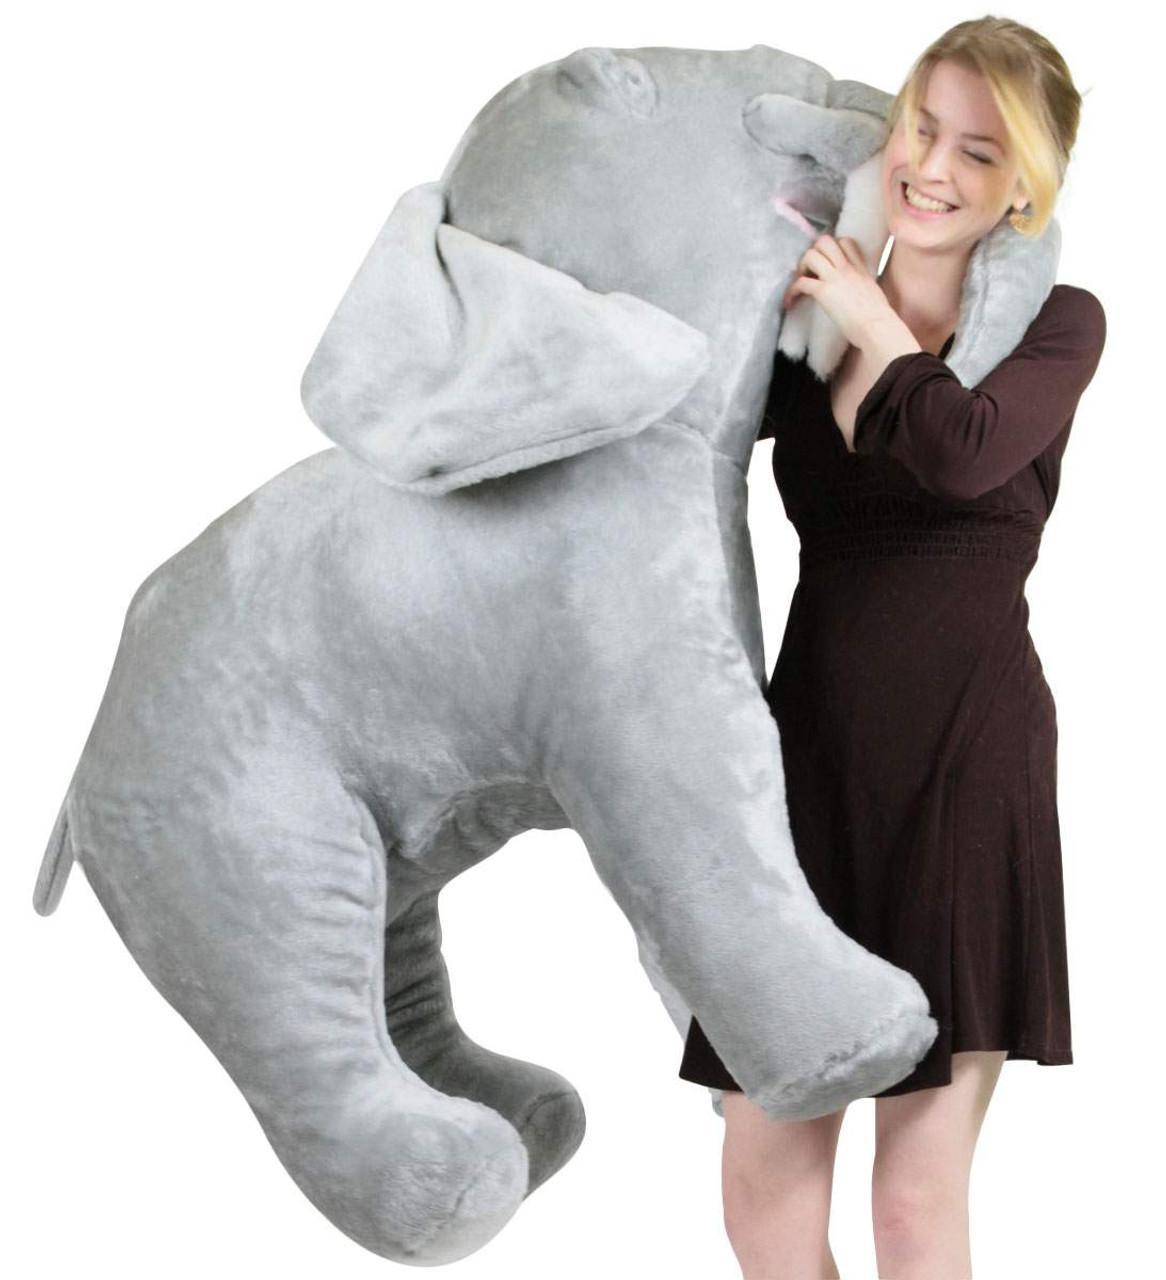 American Made Giant Stuffed Elephant 48 Inch Soft Big Plush